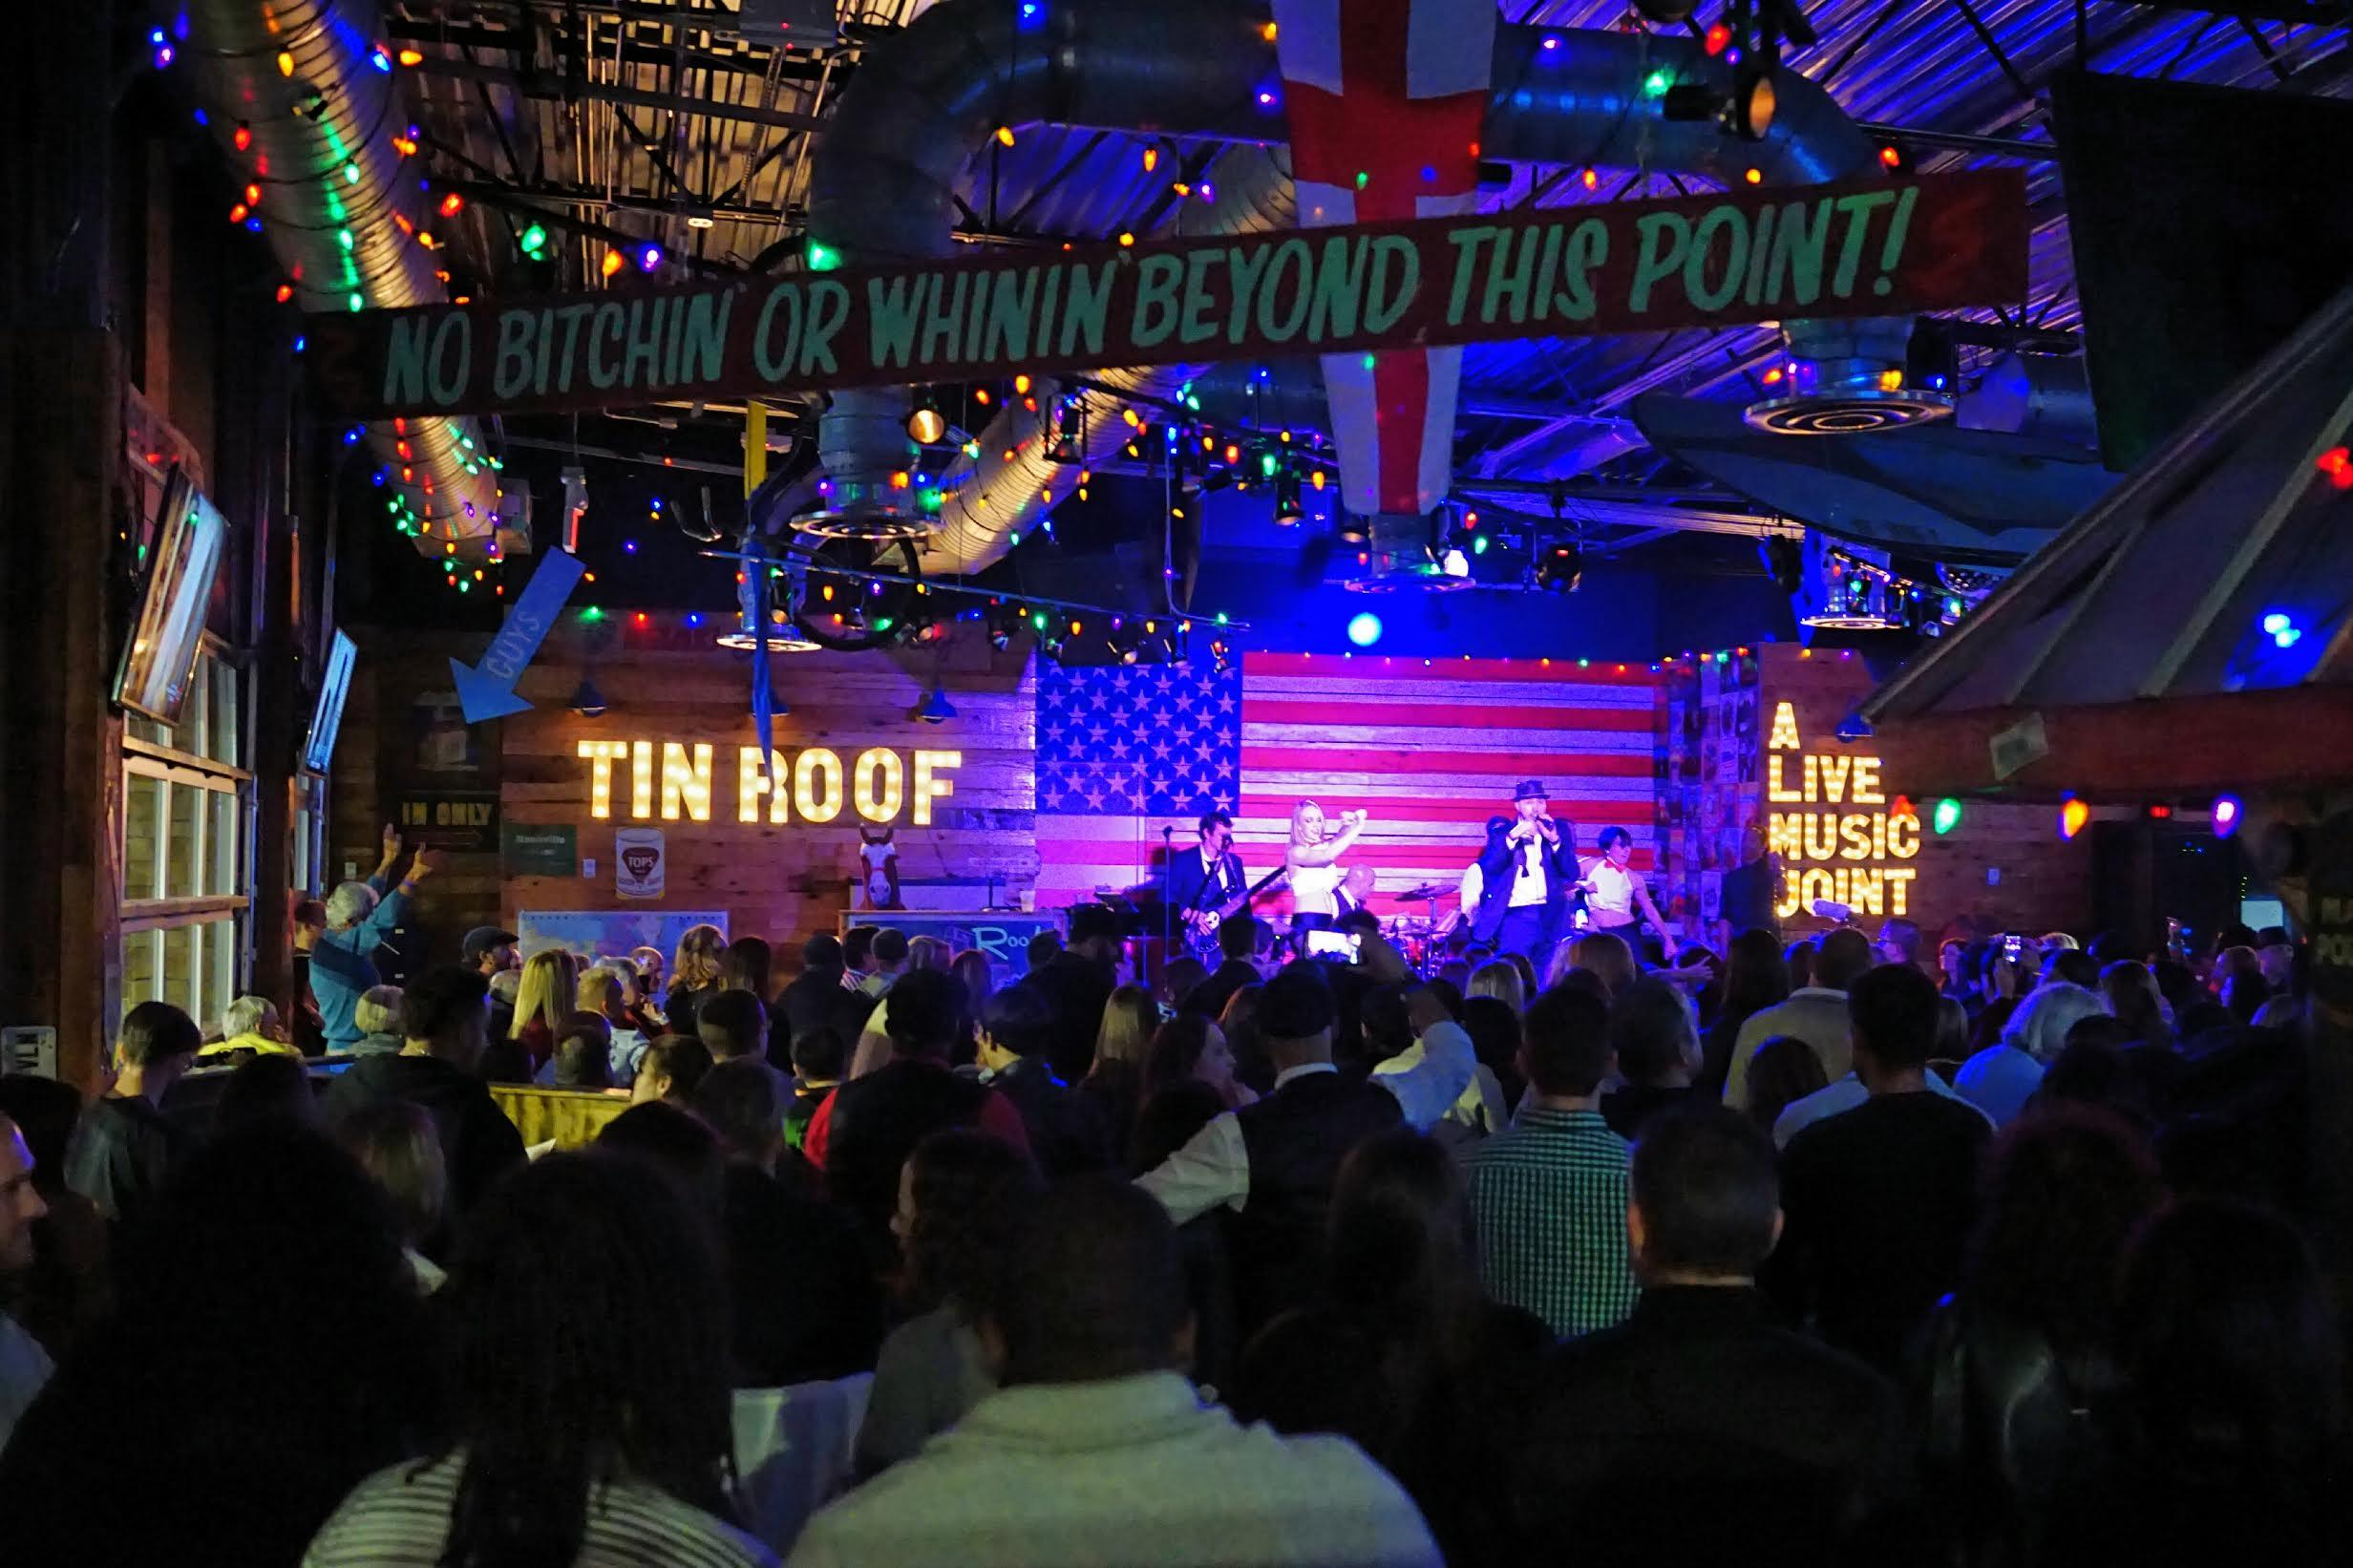 Popular Nashville Restaurant And Live Music Joint Tin Roof